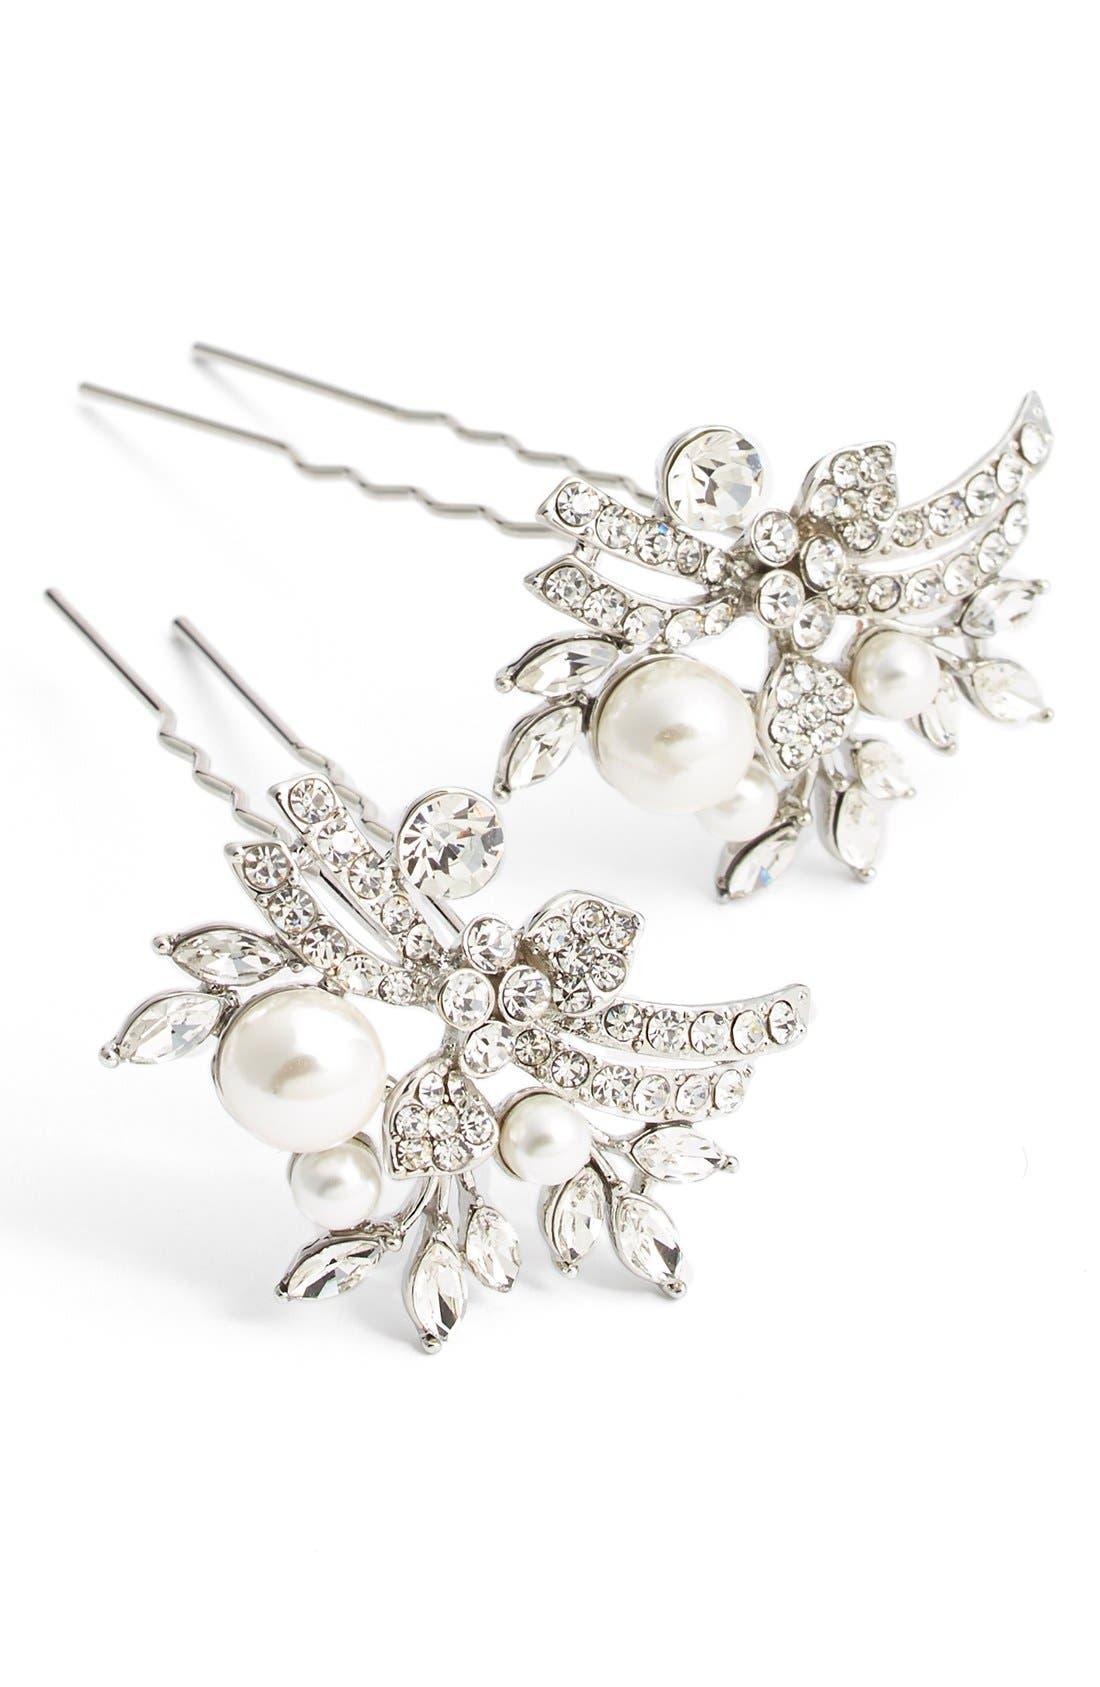 Alternate Image 1 Selected - Nina Pearly Crystal Hairpins (Set of 2)